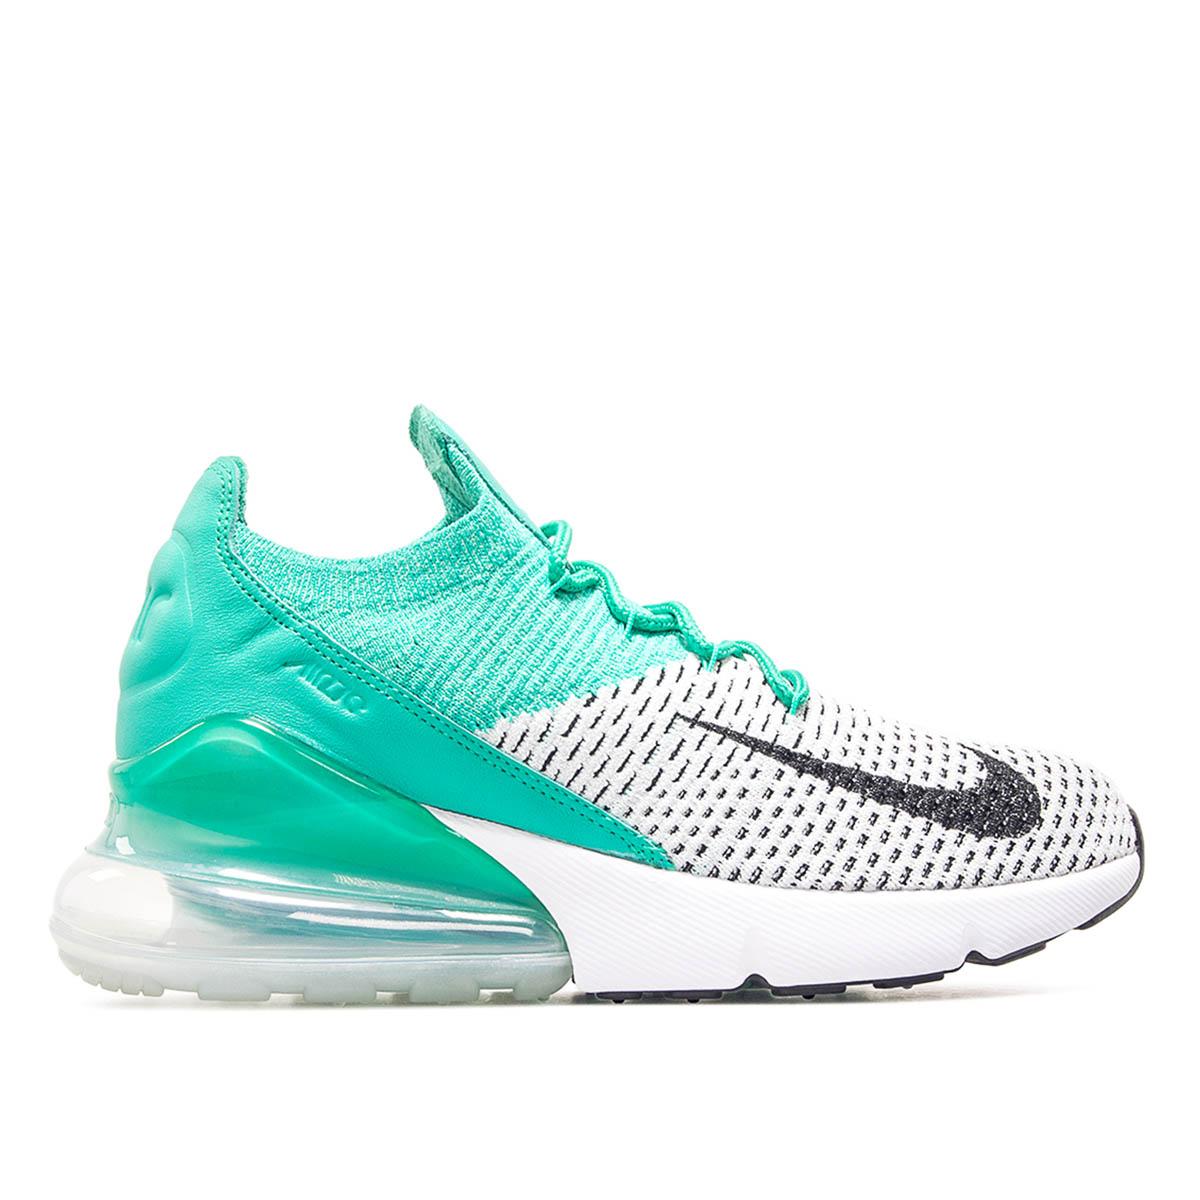 Nike Air Max 97 GreenWhite Größe 43, gebraucht